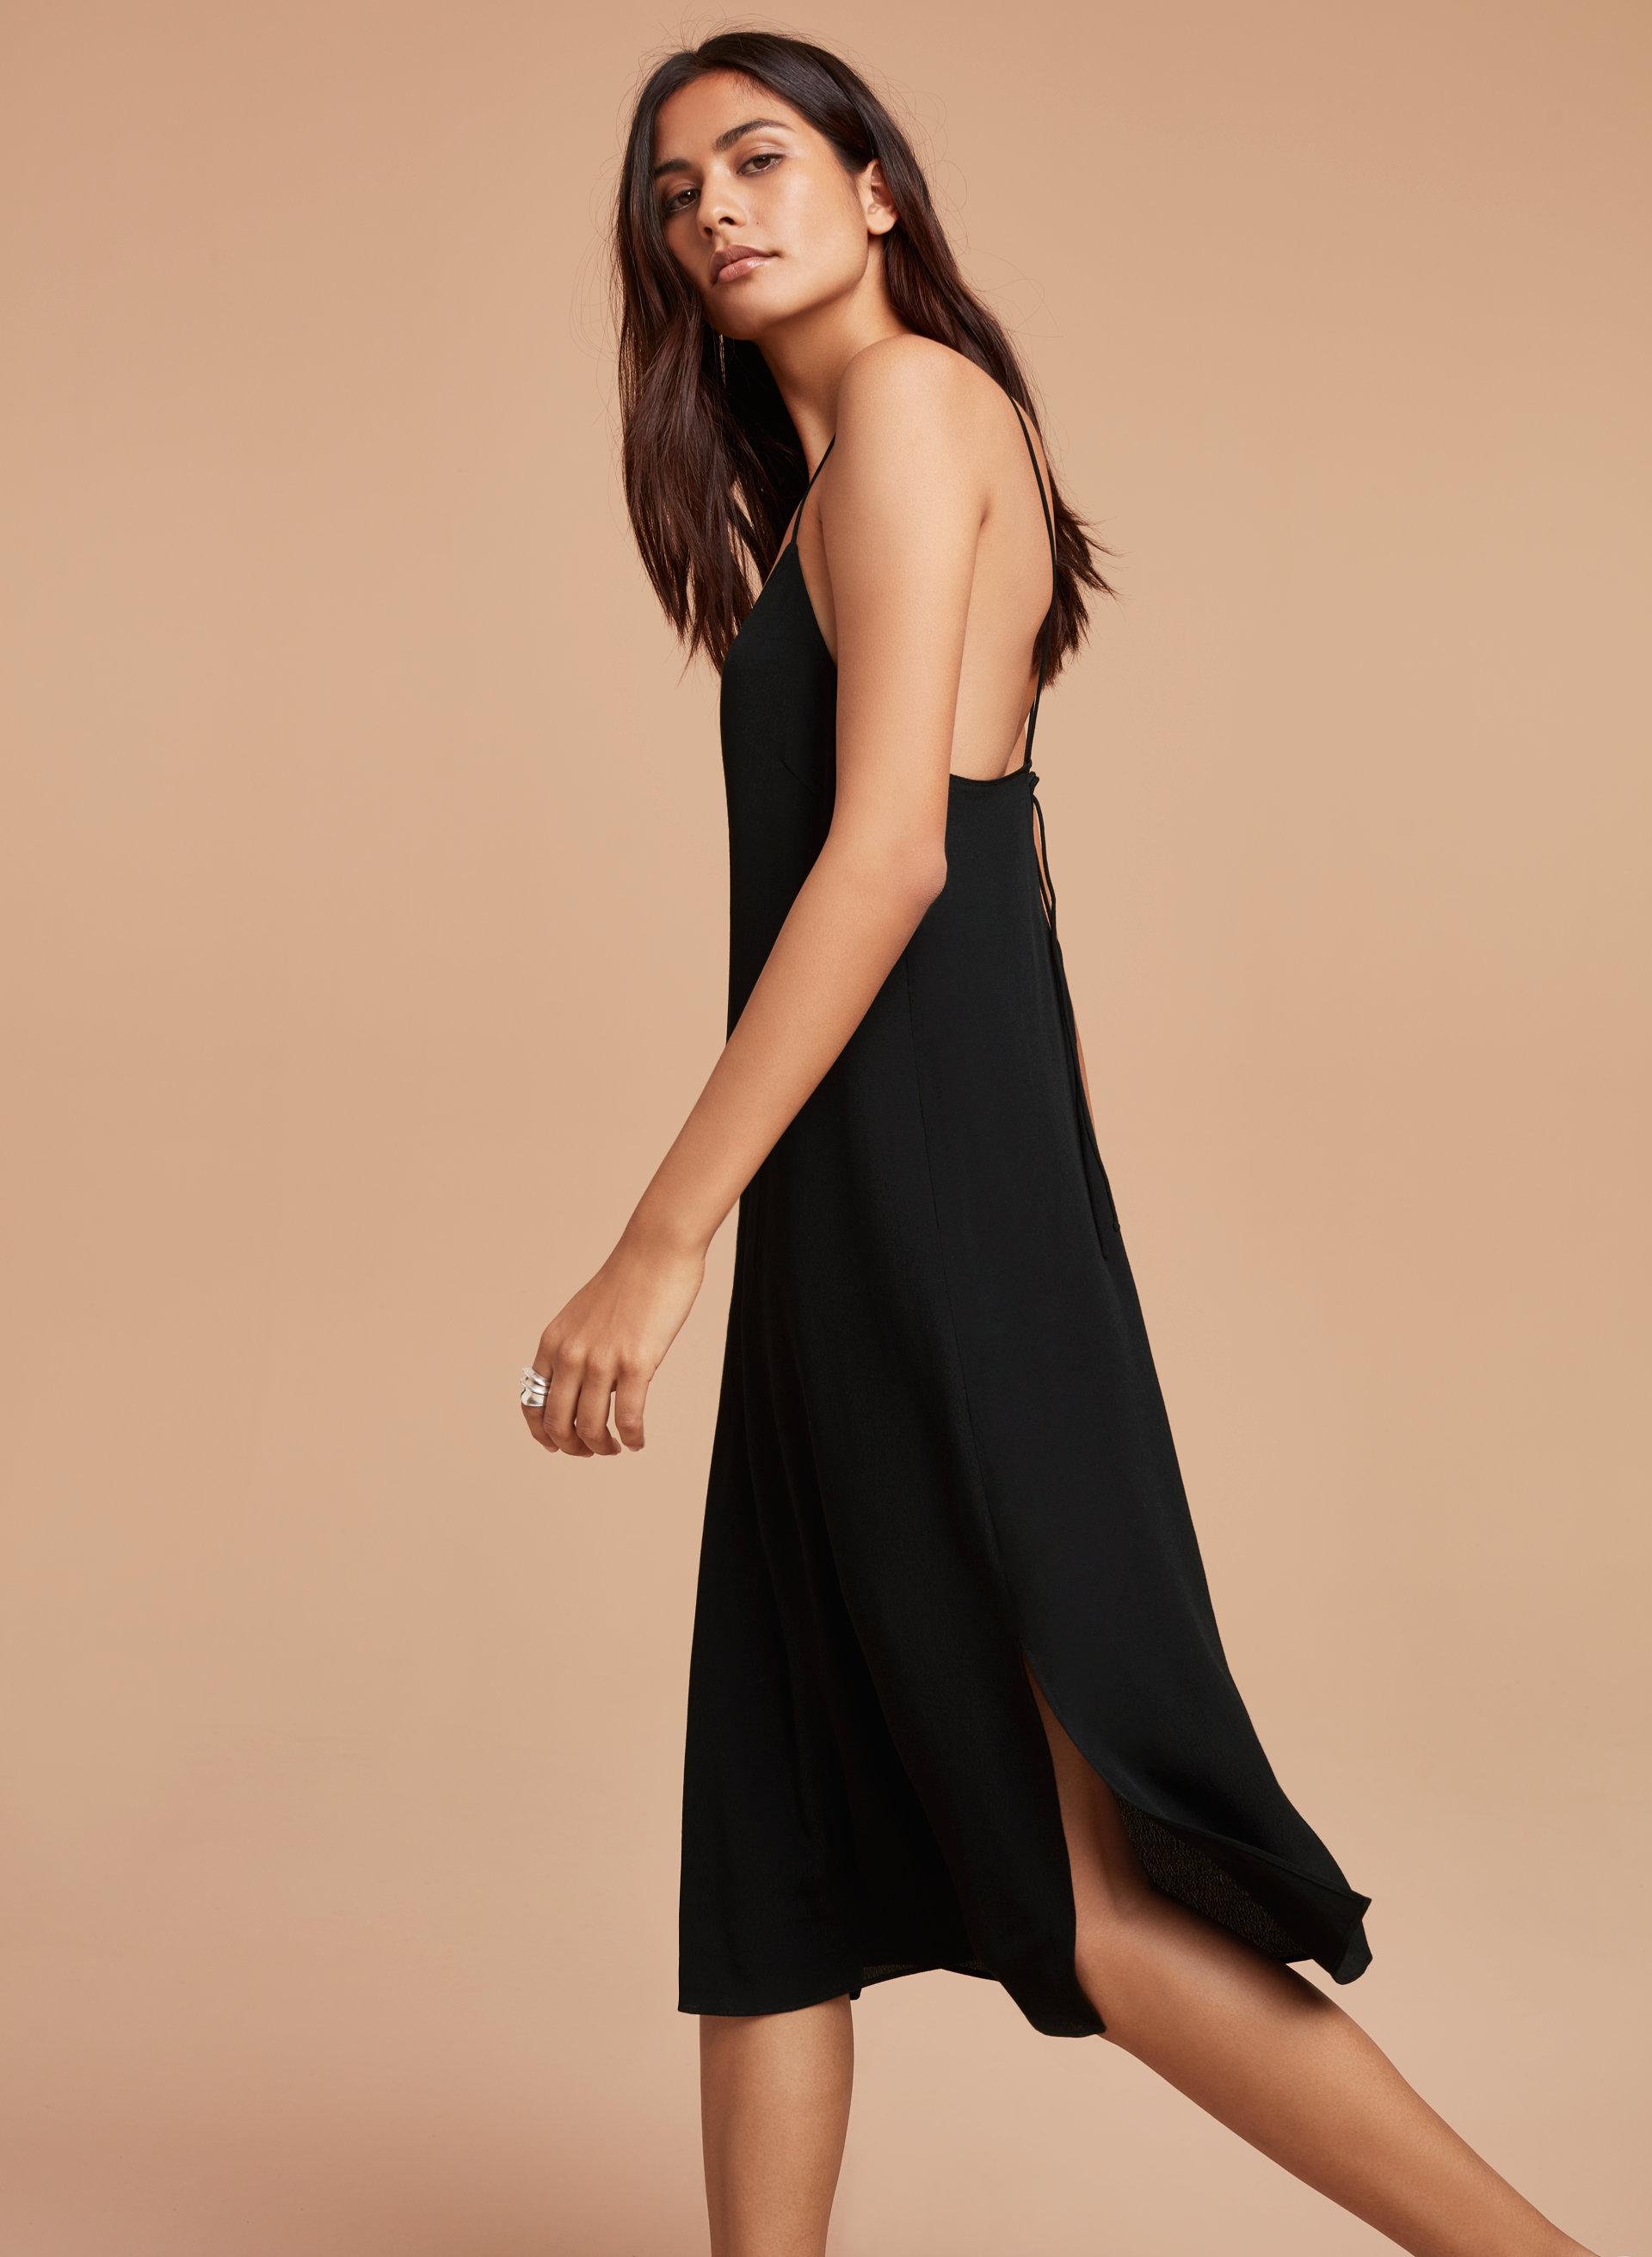 Black dress images - Felicity Dress Aritzia